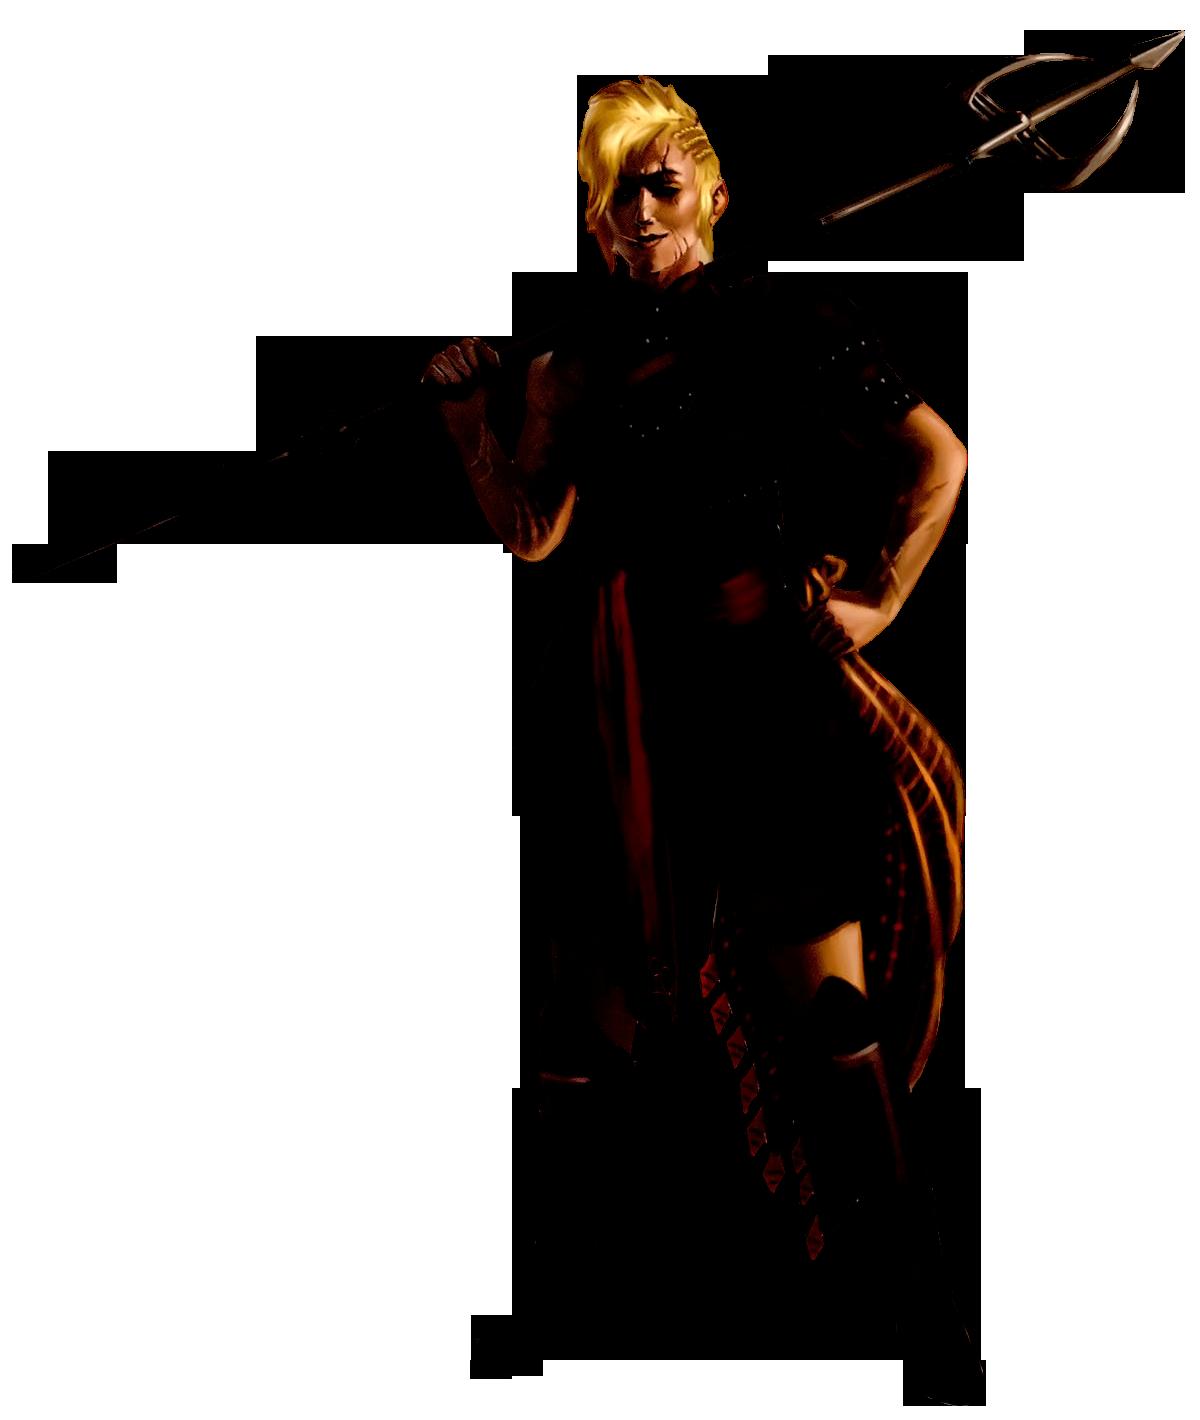 Gladiator/Legends